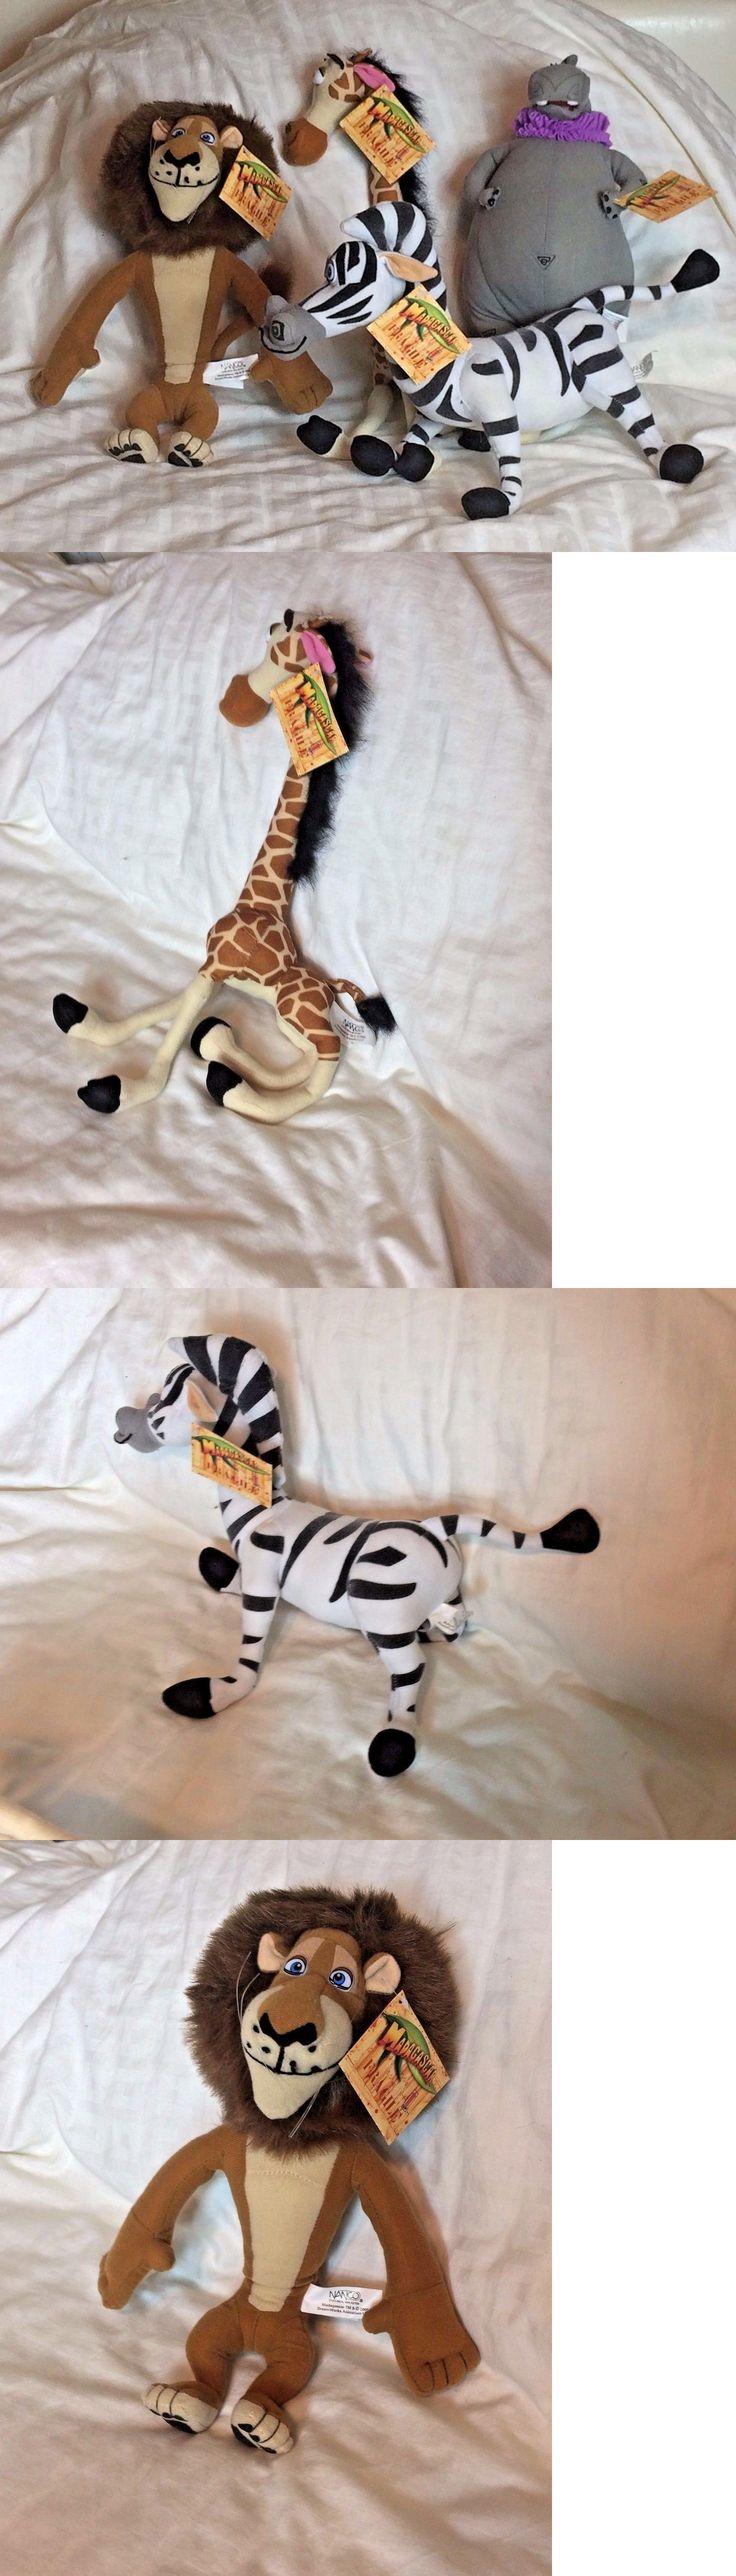 Madagascar 168210: Madagascar Plush Nanco Lot Melman Giraffe Alex Lion Marty Zebra Gloria Hippo Nwt -> BUY IT NOW ONLY: $30 on eBay!